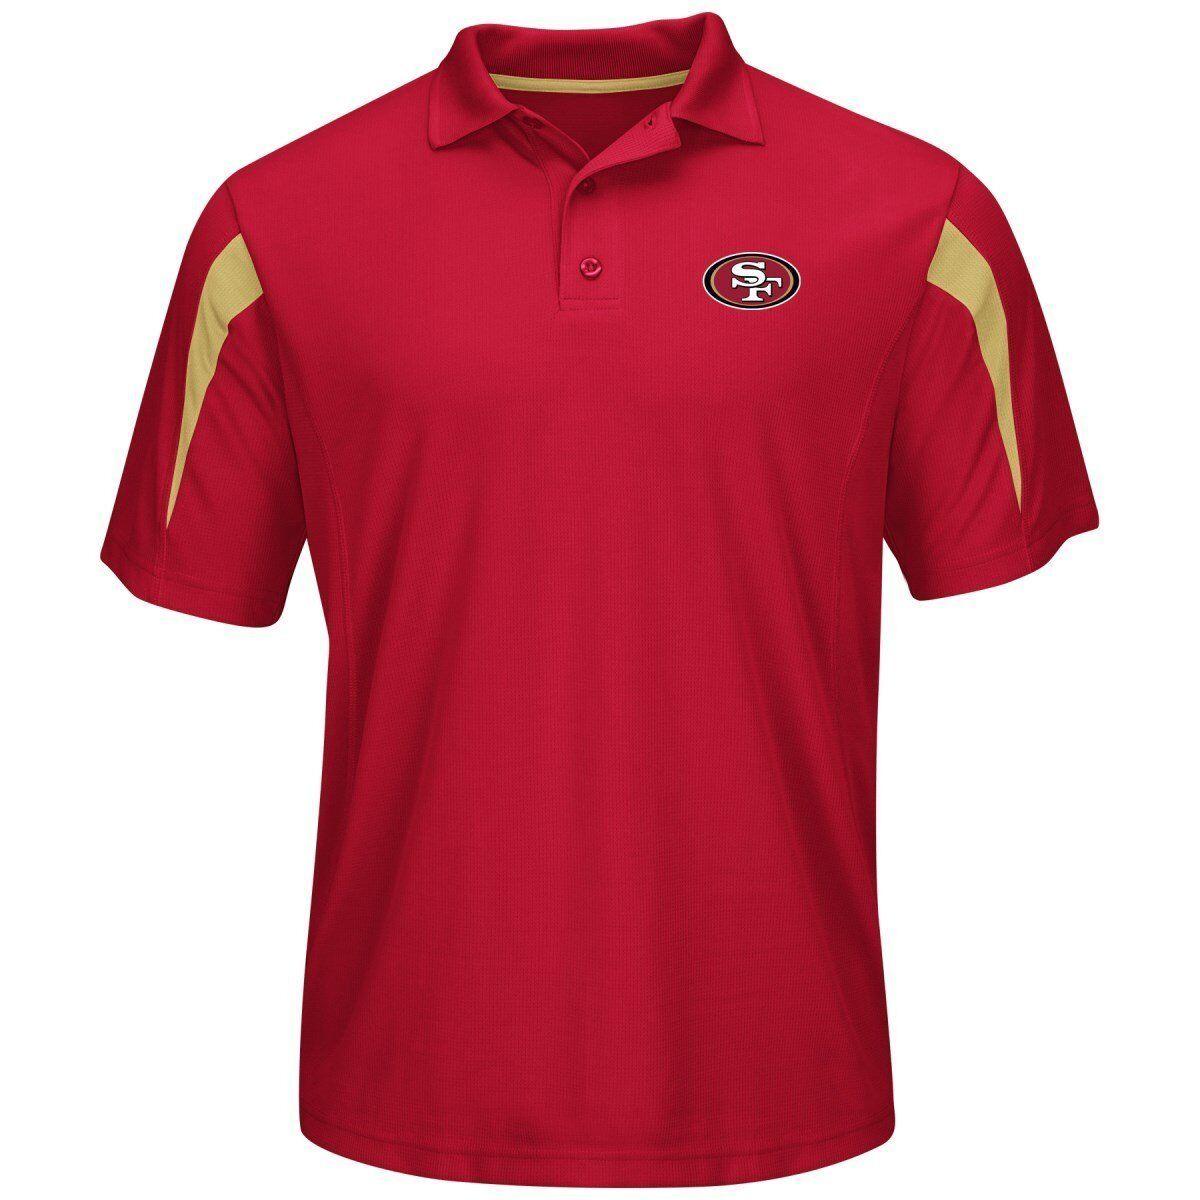 NFL Football Poloshirt Shirt SAN FRANCISCO FRANCISCO FRANCISCO 49ers Field Classic Performance Polo e20068